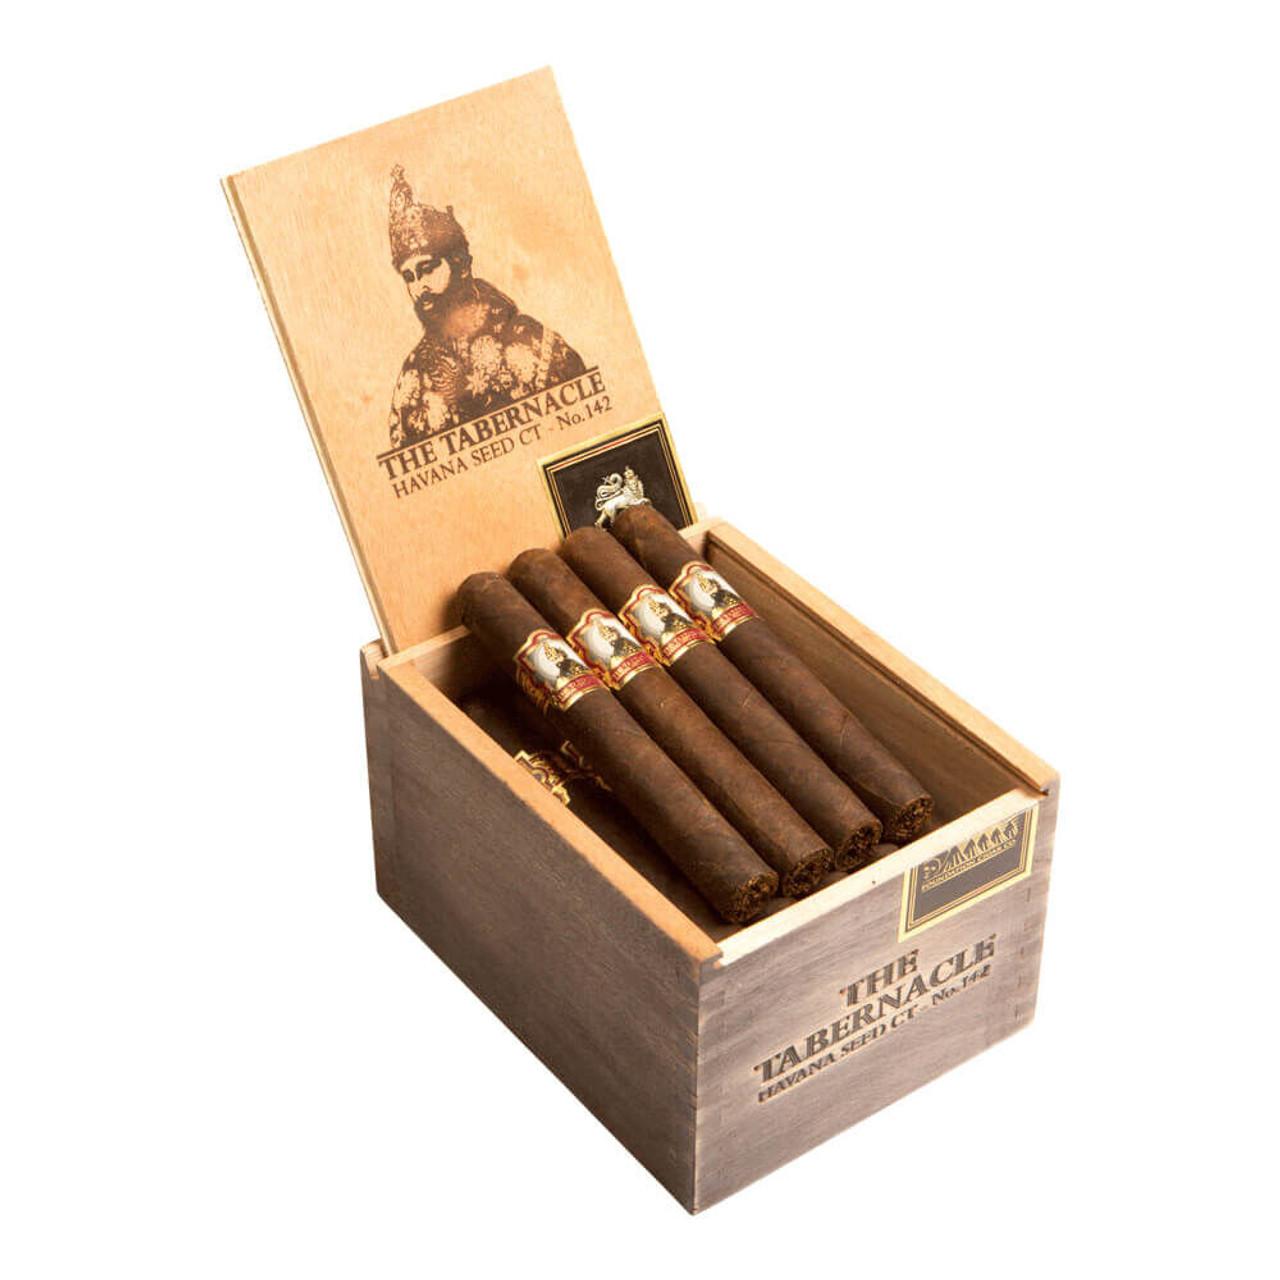 Foundation The Tabernacle No. 142 Havana Seed CT Toro Cigars - 6.0 x 52 (Box of 24)